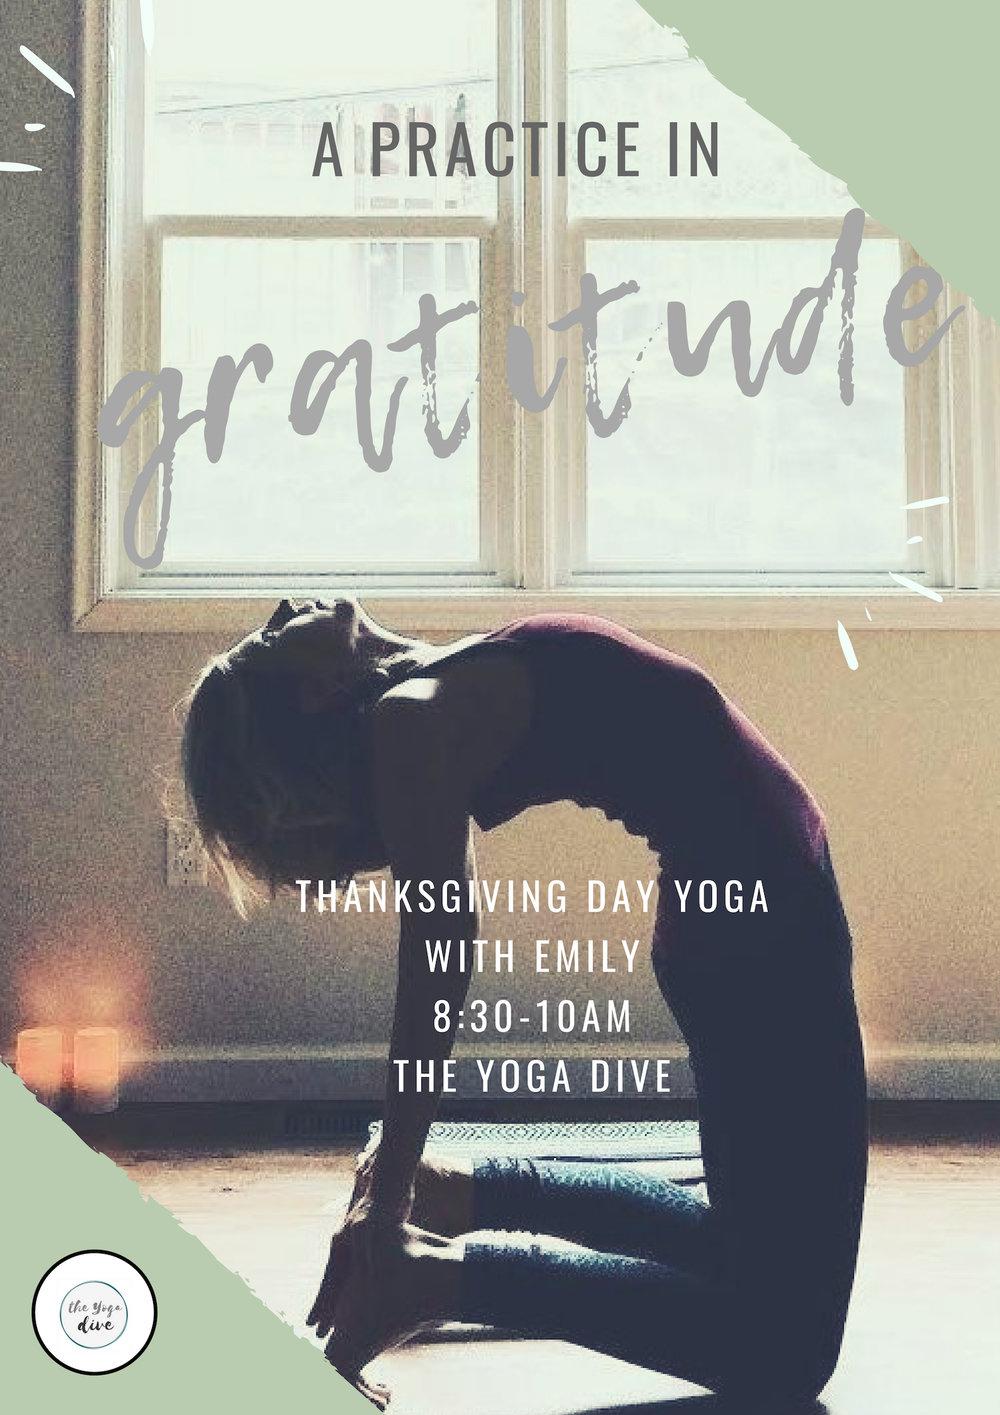 THanksgiving day yoga.jpg